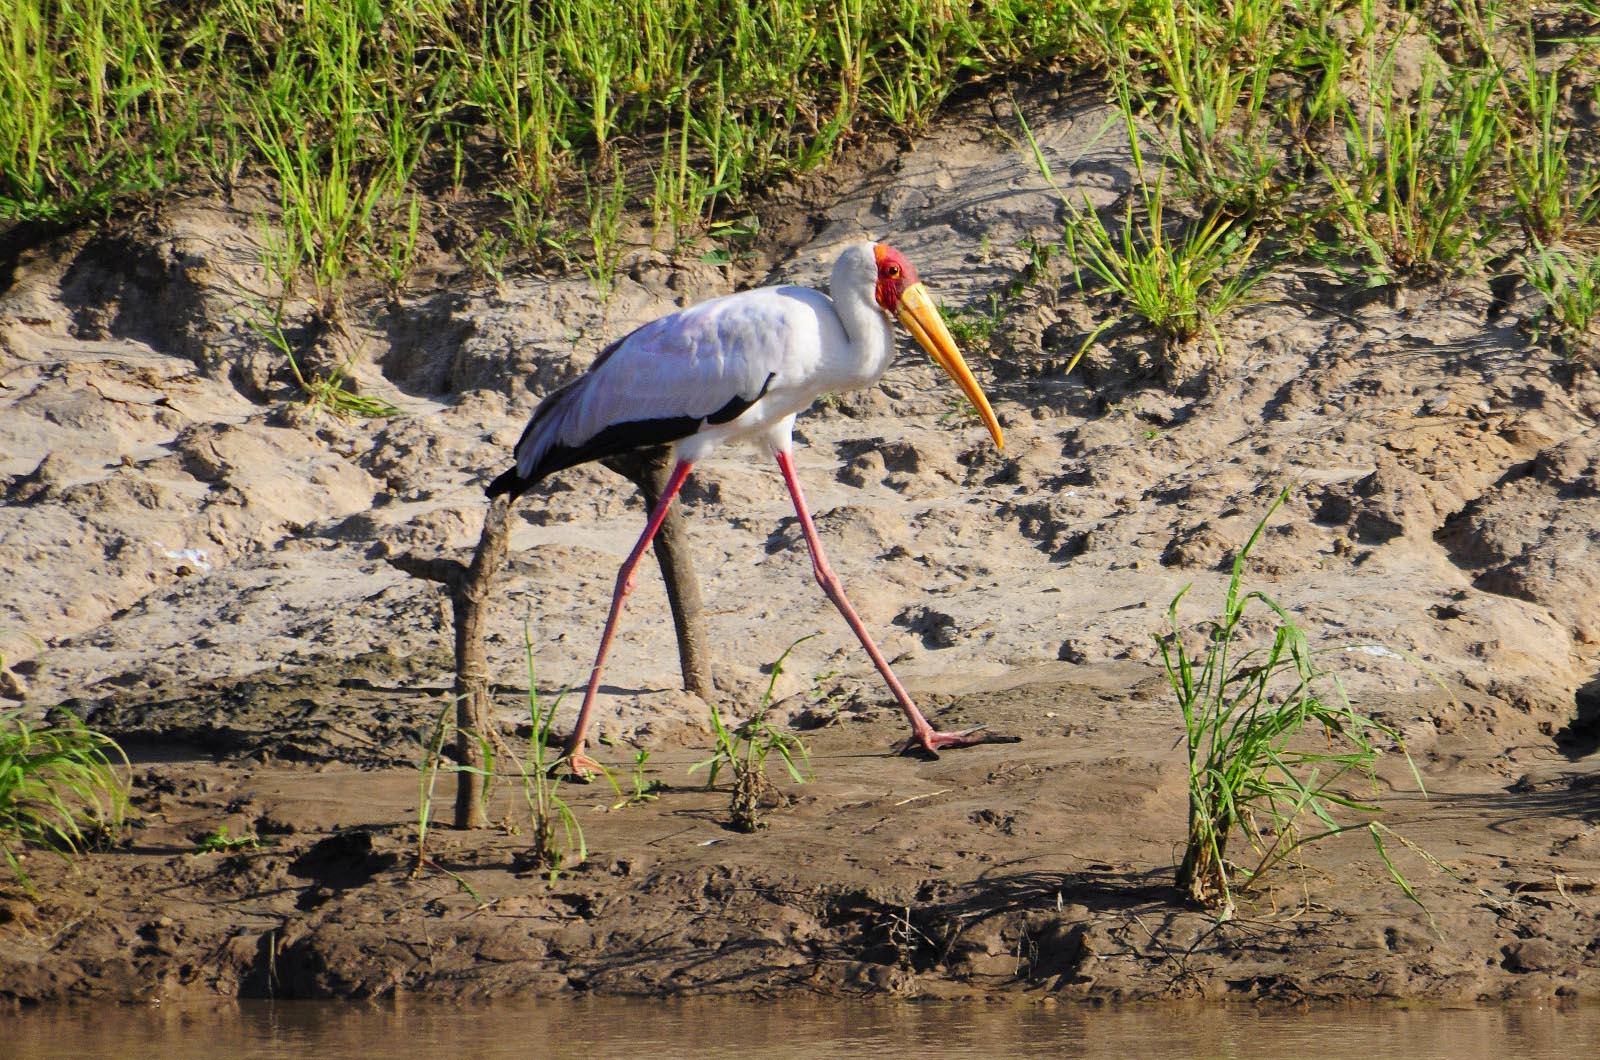 chikunto-lodge-zambia-in-style-safari-packages-lodges-luxury-tents-south-luangwa-boat-safaris-bird-wildlife